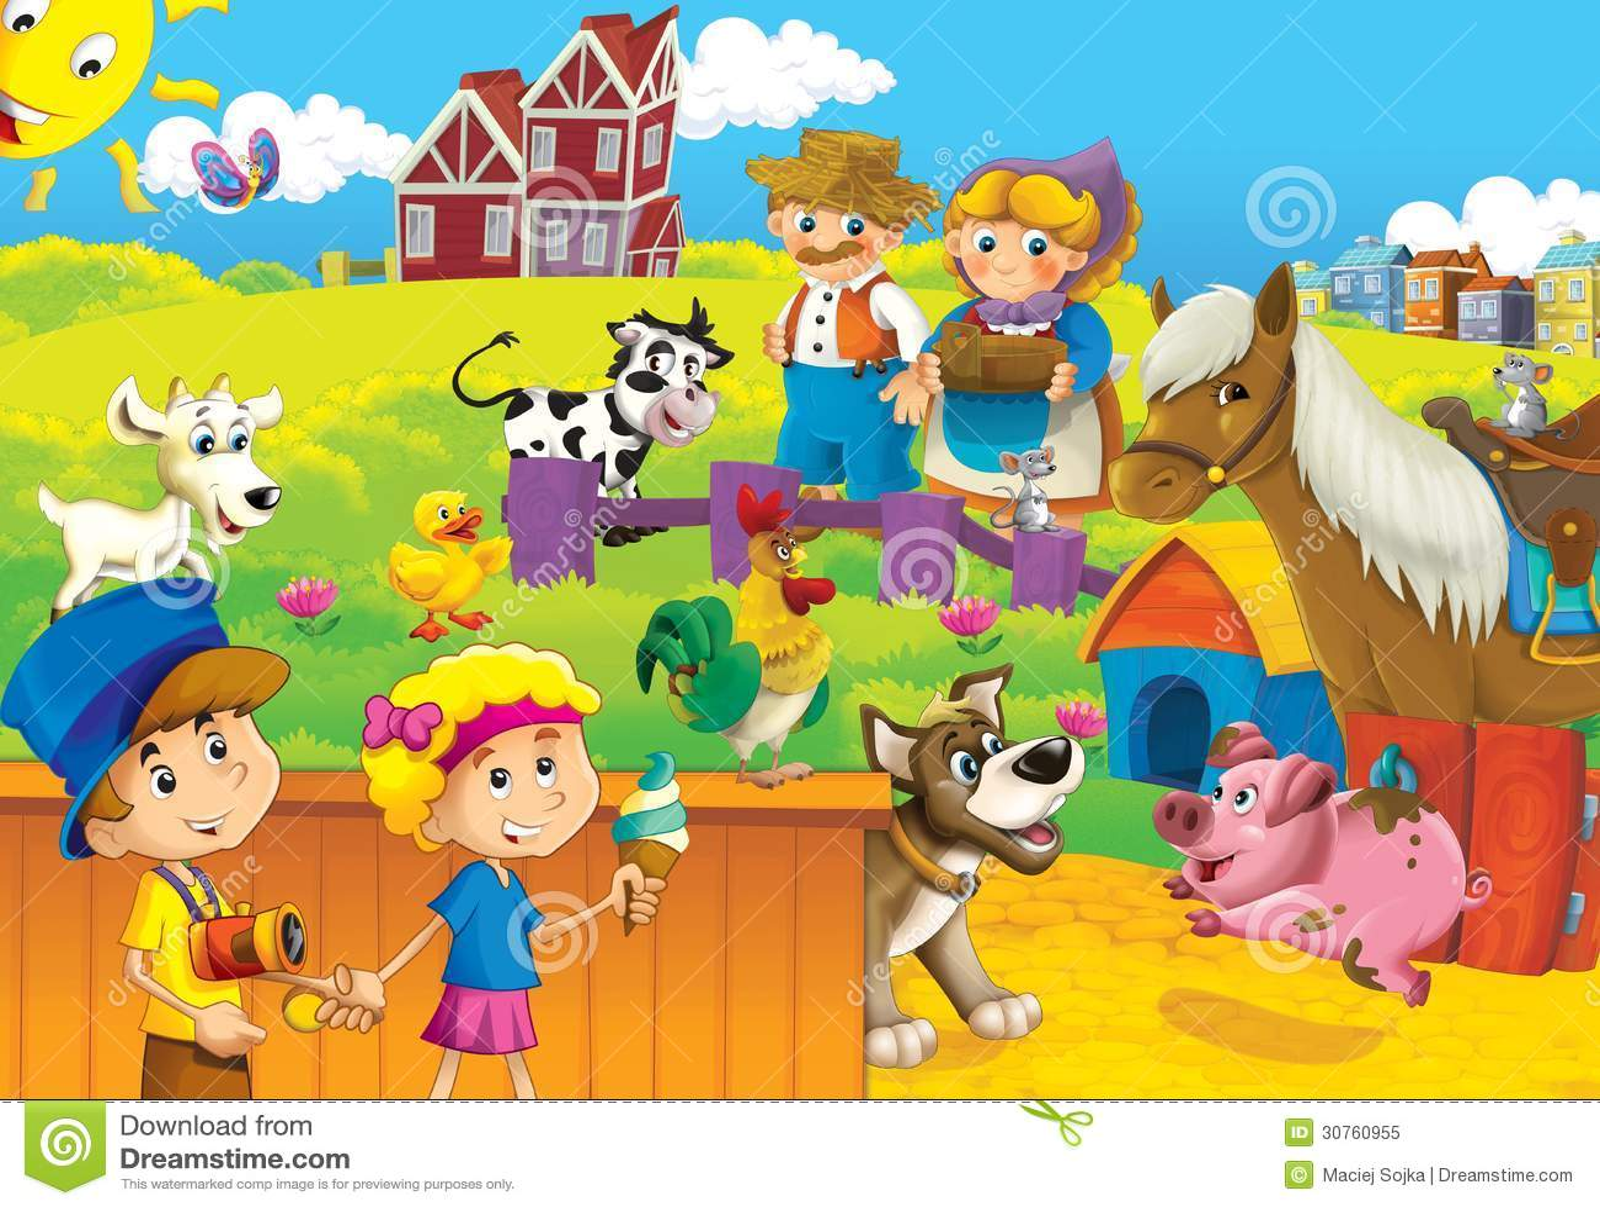 Farm Animals For Kids The Farm Illust...